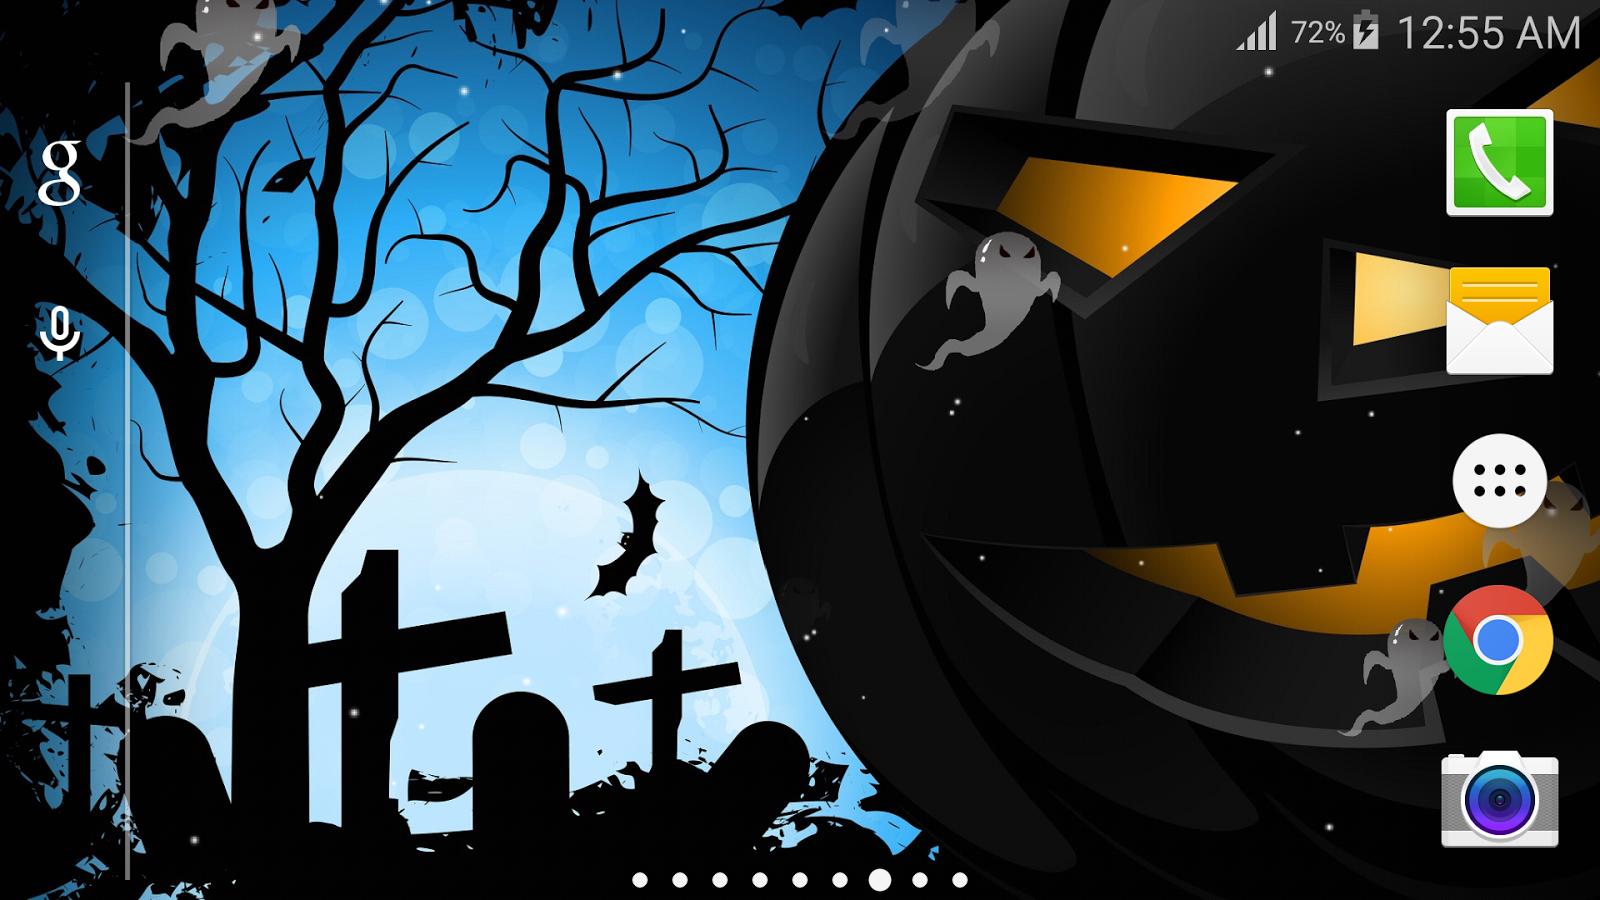 halloween party live wallpaper screenshot - Halloween Party Wallpaper